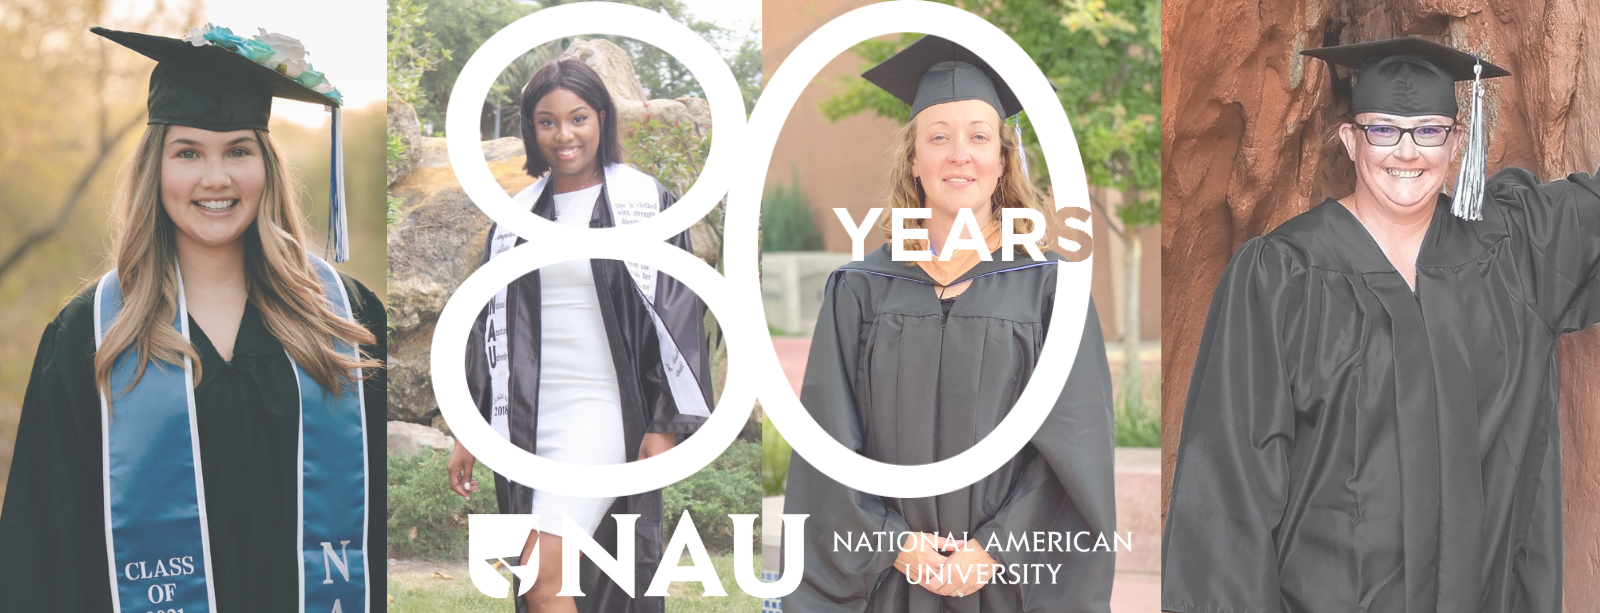 NAU 80-year Anniversary Alumni Collage Header